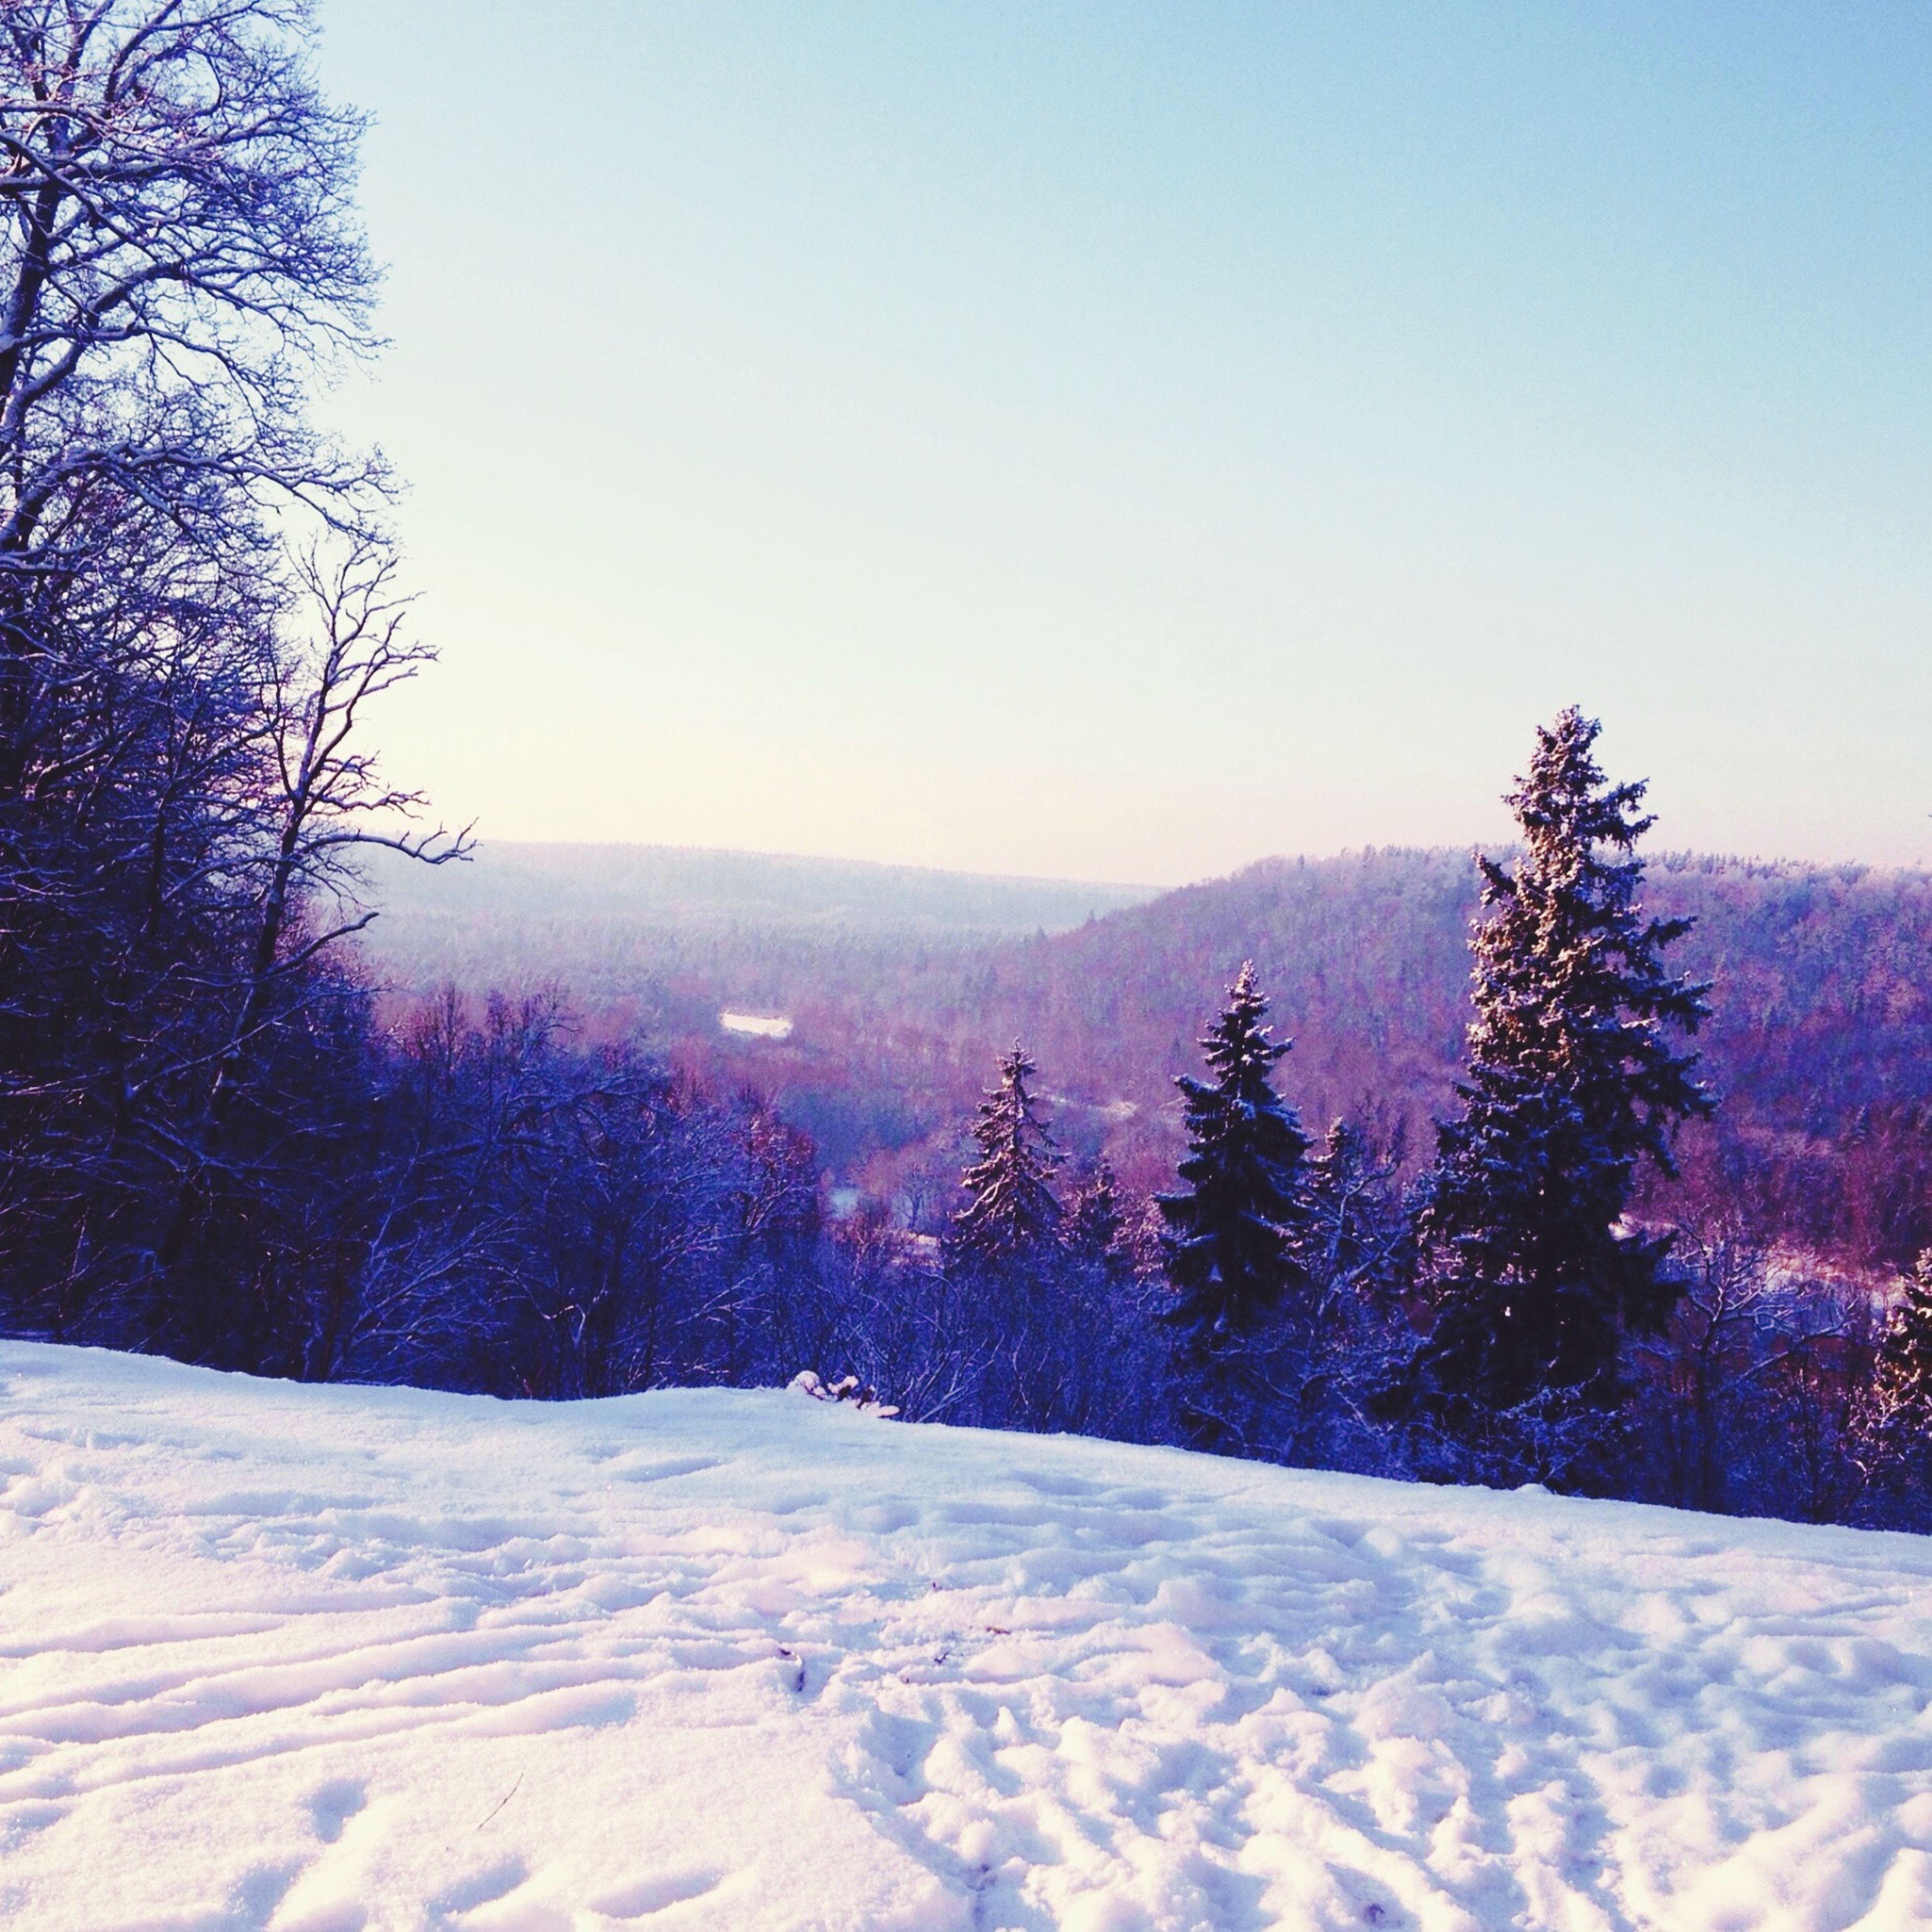 snow, winter, cold temperature, season, tree, clear sky, tranquil scene, weather, tranquility, landscape, scenics, beauty in nature, covering, nature, copy space, mountain, non-urban scene, field, frozen, bare tree